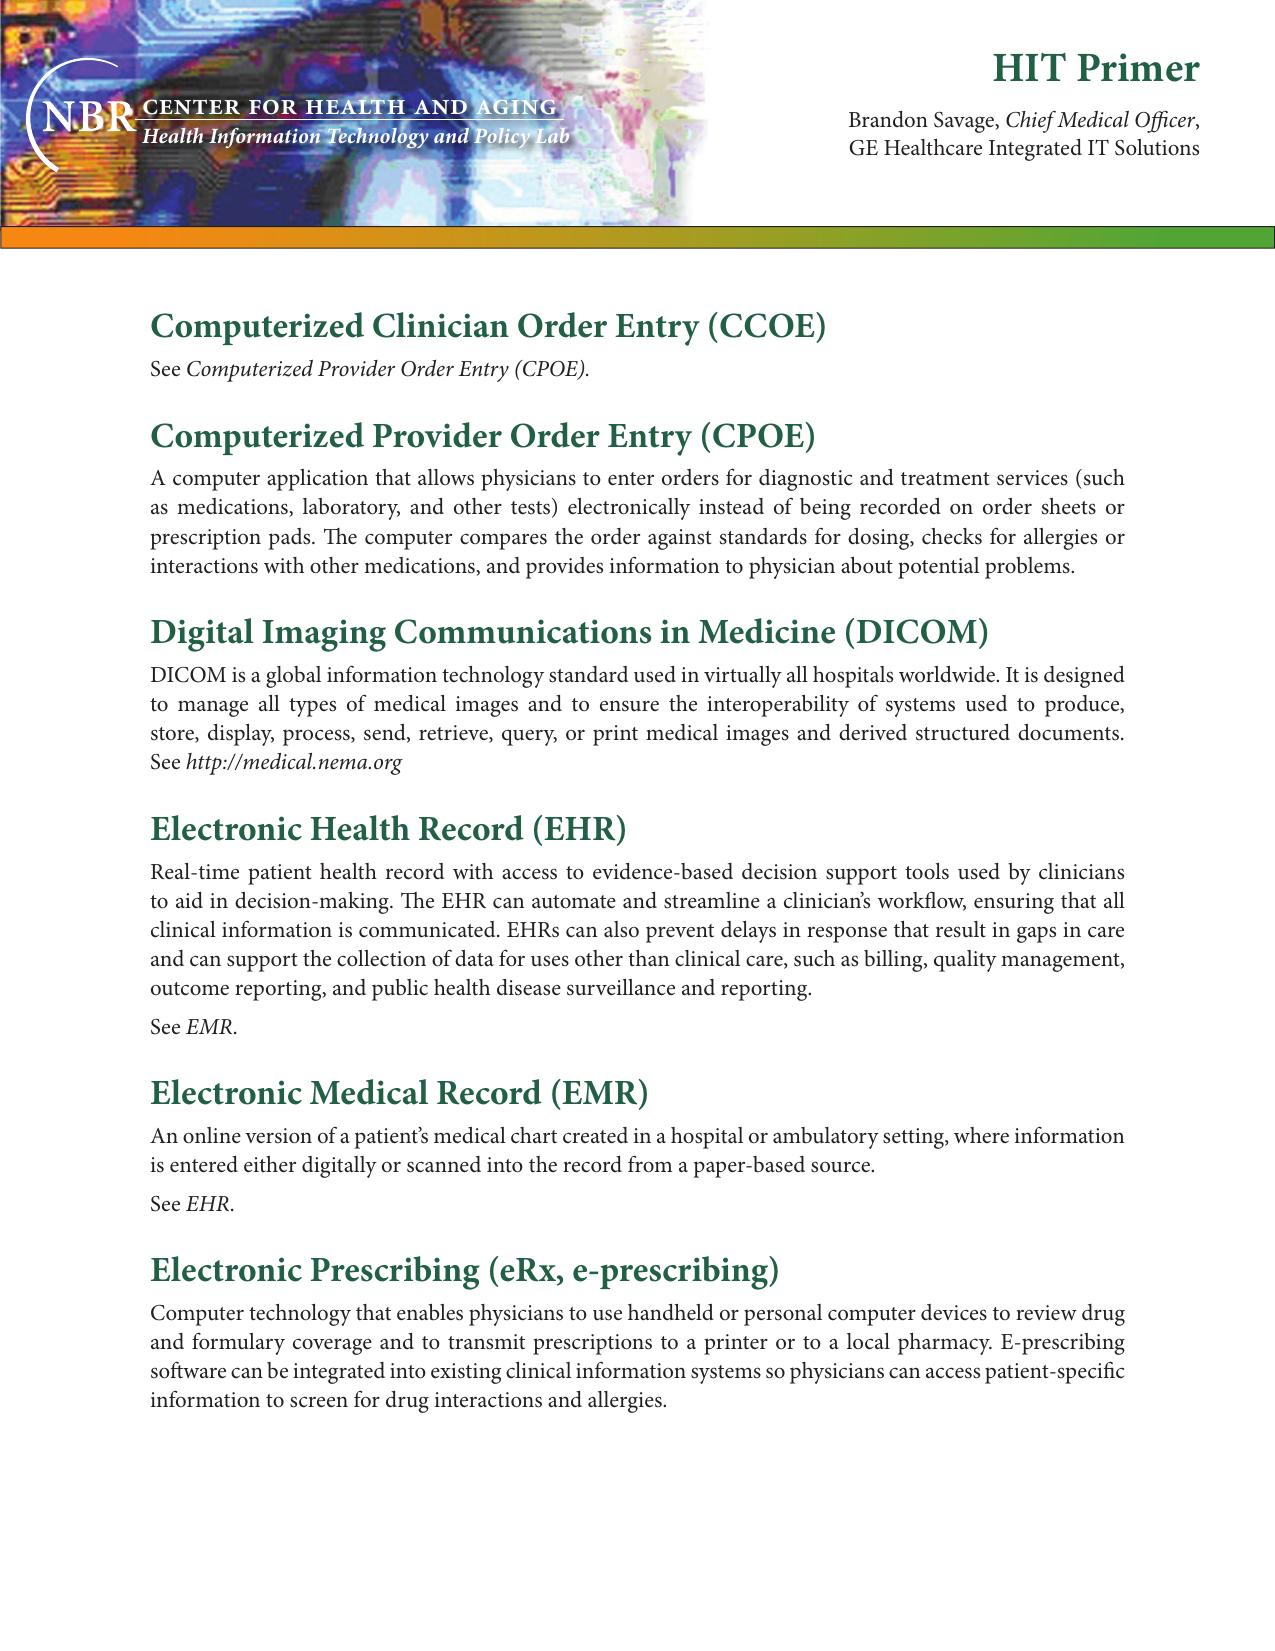 HIT Primer - Pacific Health Summit